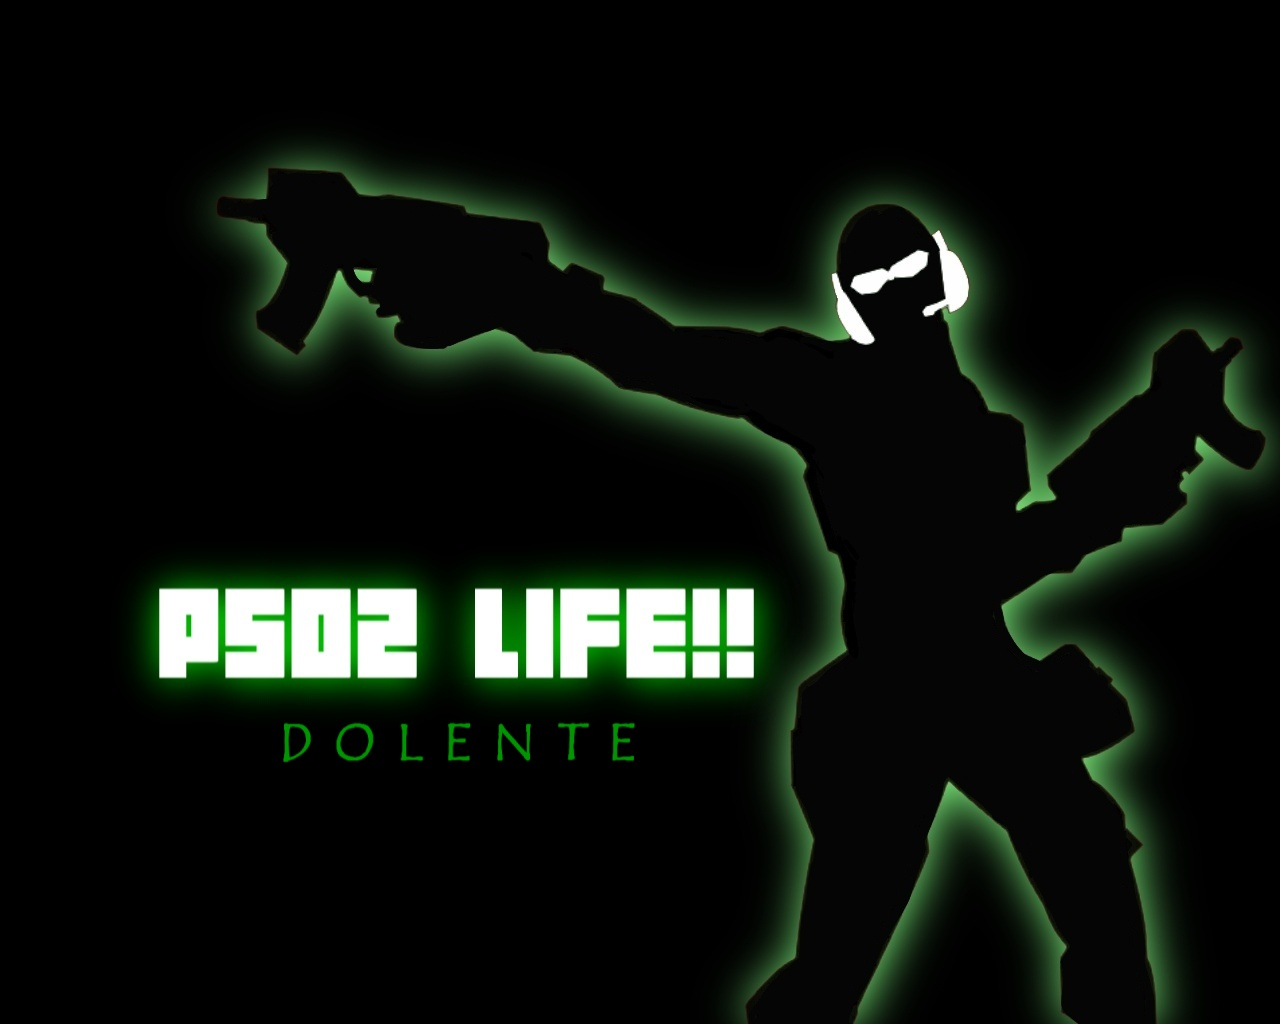 paso2lifed.jpg